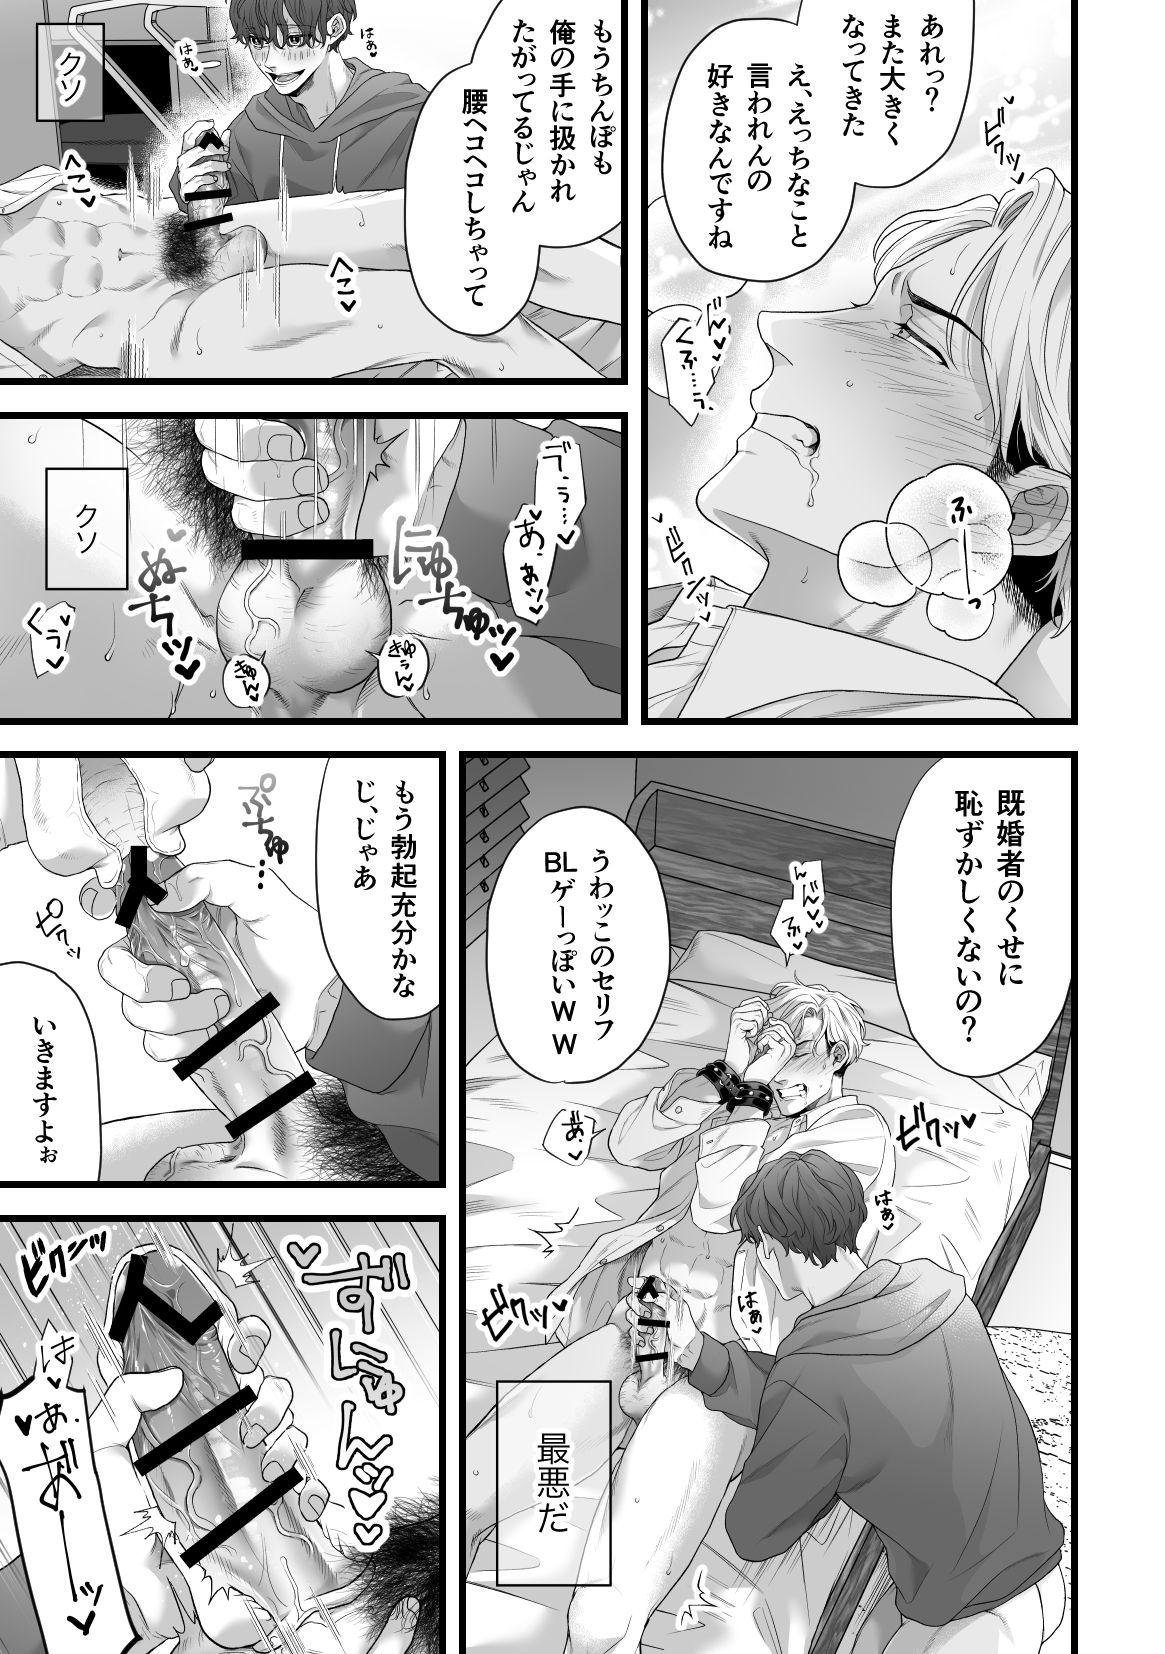 Gikei Ryoujoku 14